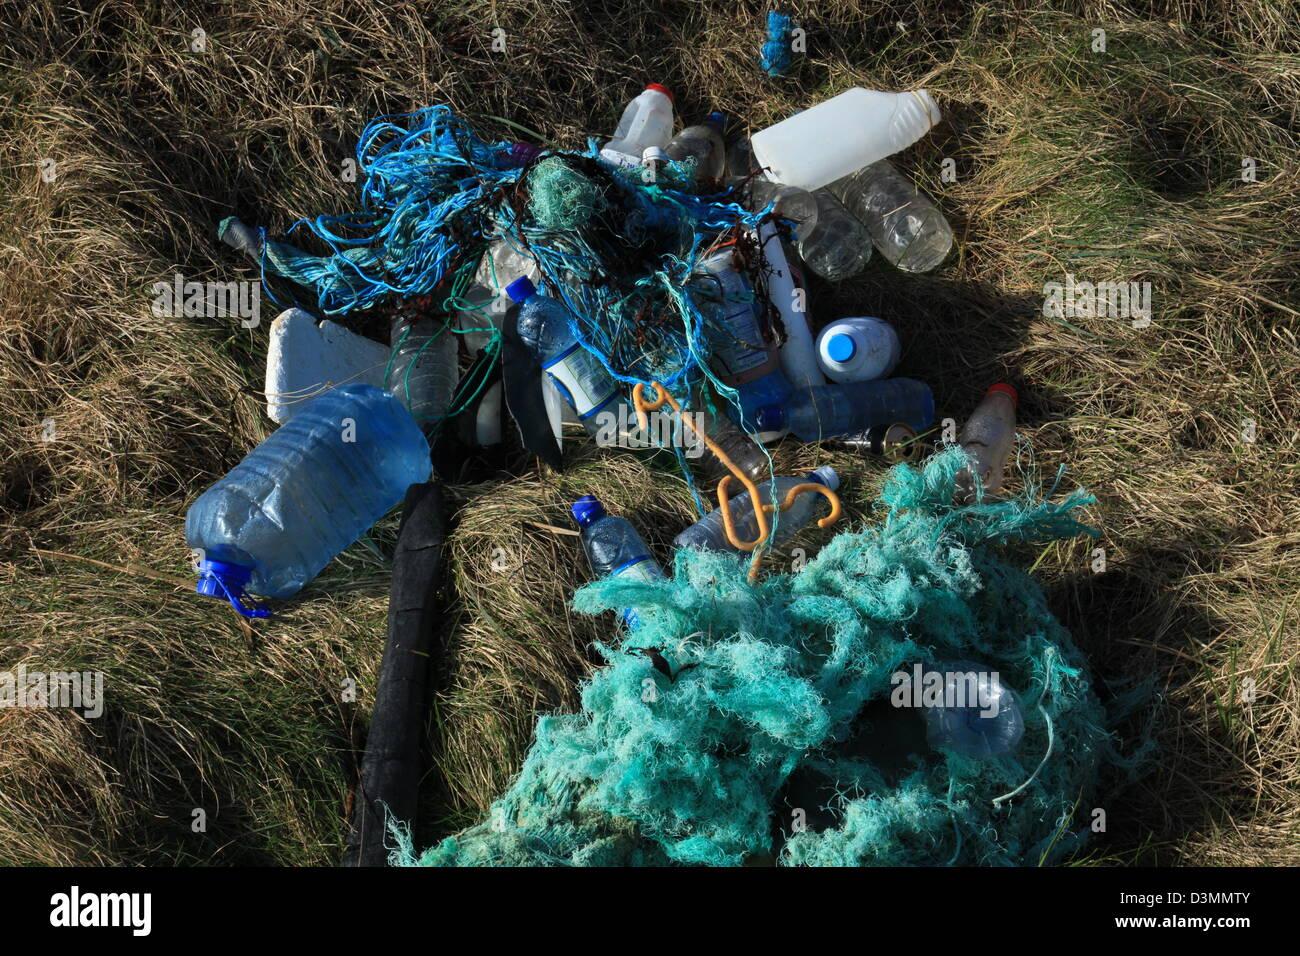 large quantities of plastic rope and bottles lying on the irish atlantic coast - Stock Image